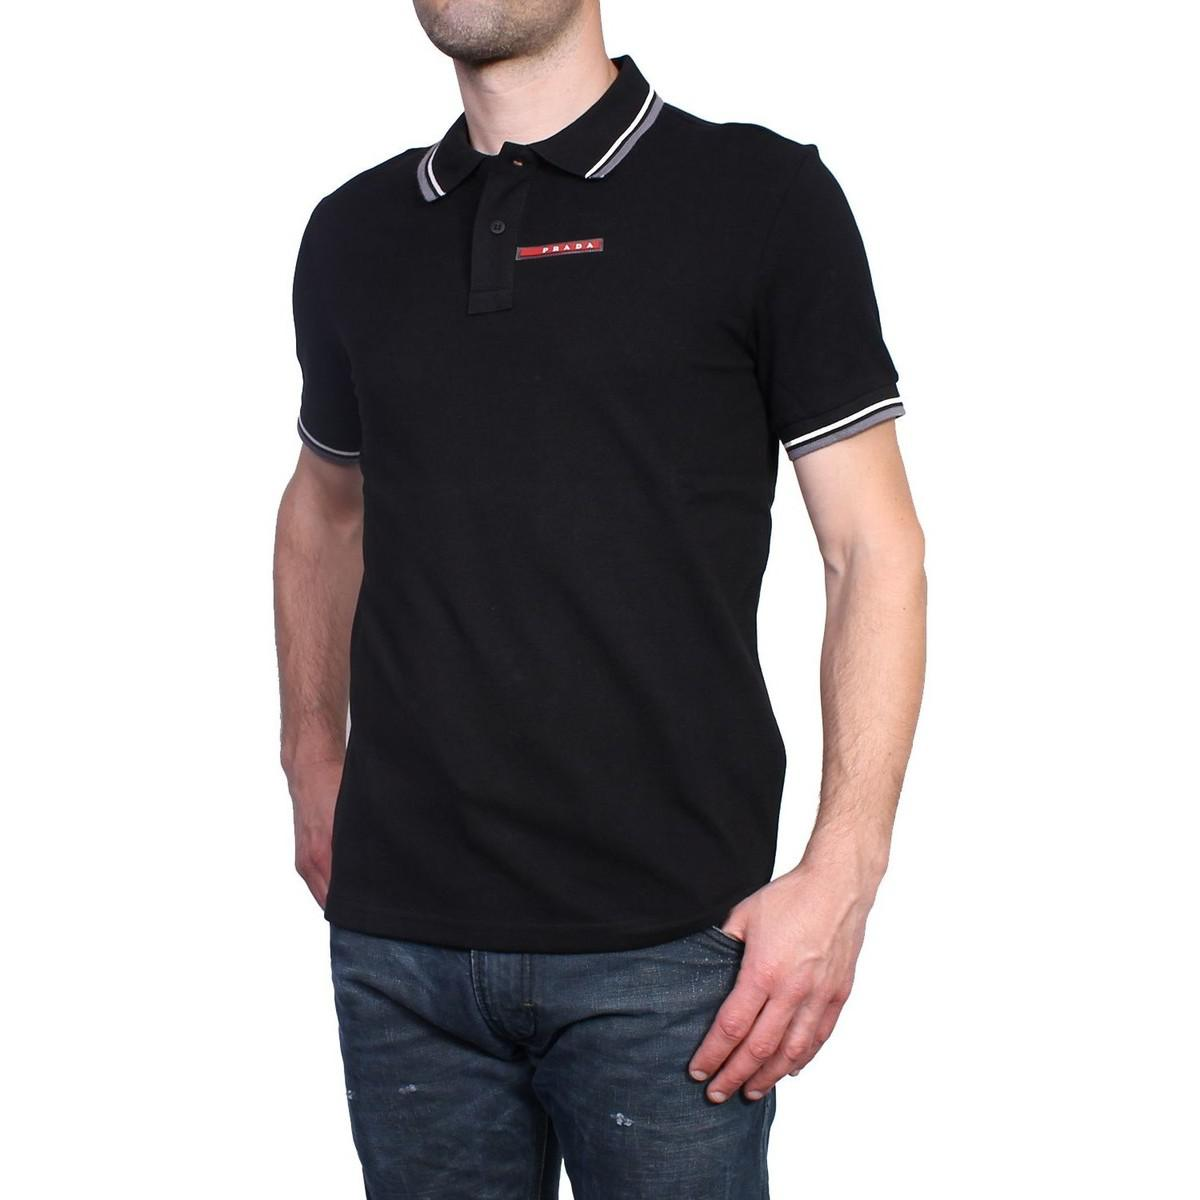 13fd758c Prada Polo Shirts For Mens - Nils Stucki Kieferorthopäde